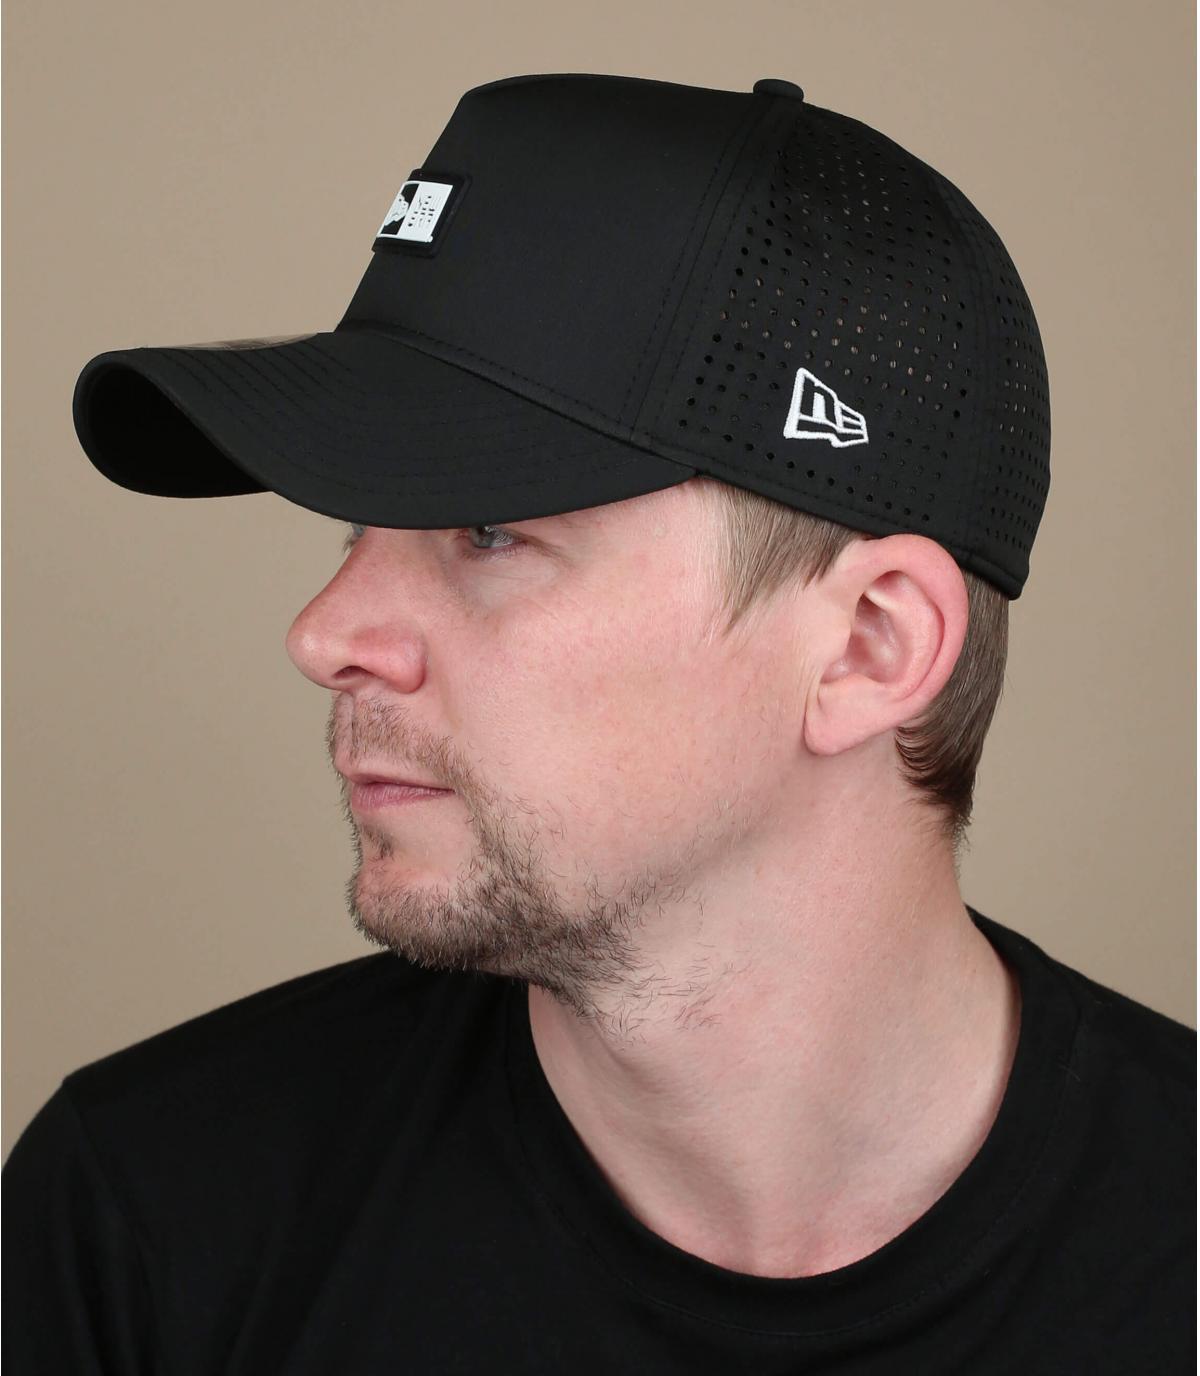 casquette New Era noir